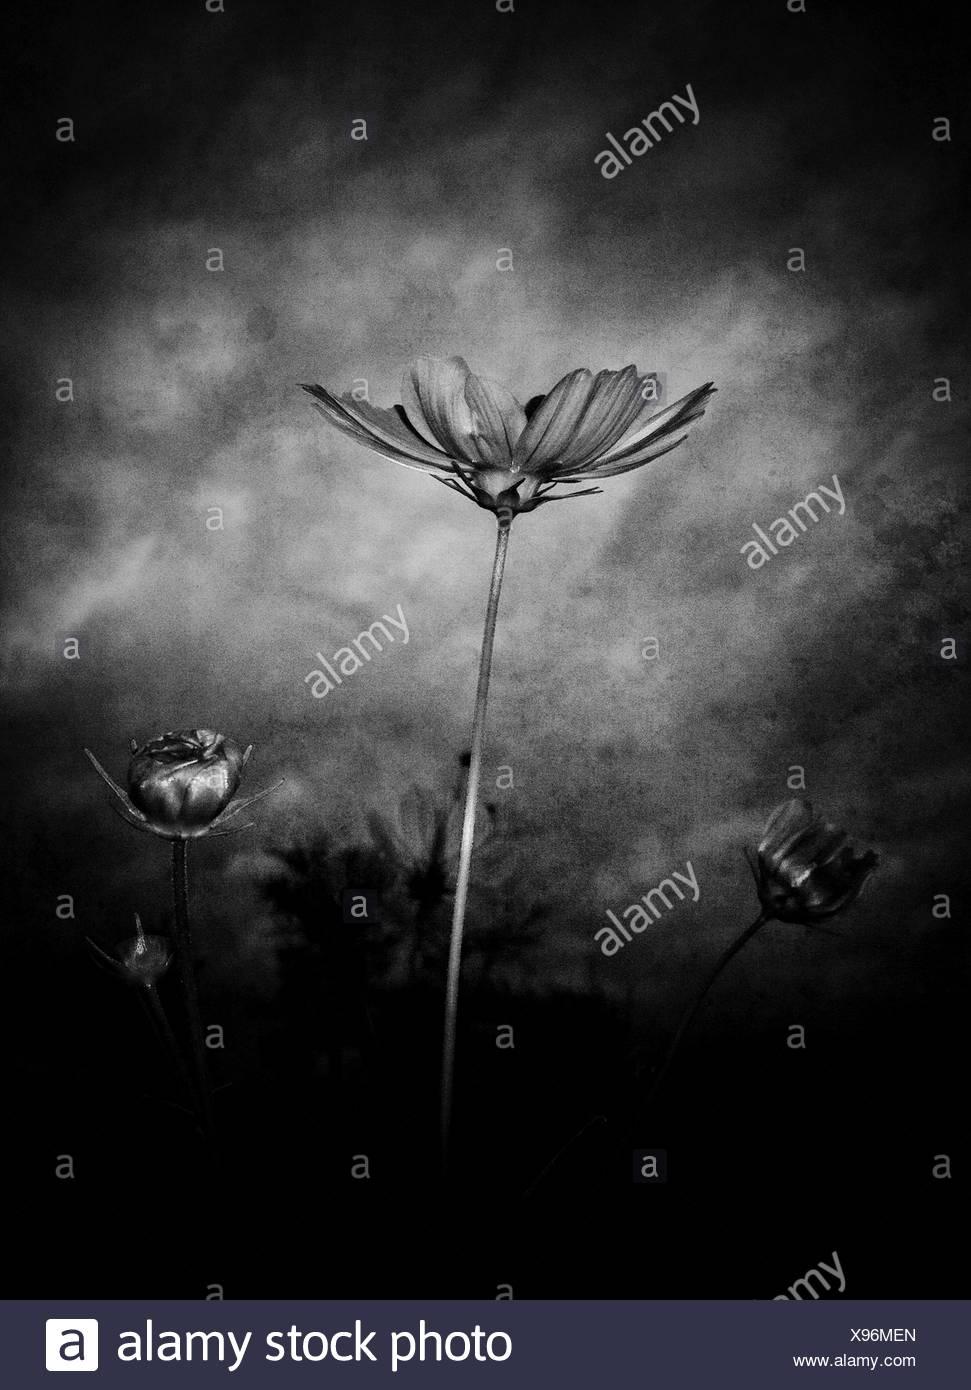 Flowering Plants Growing On Field - Stock Image